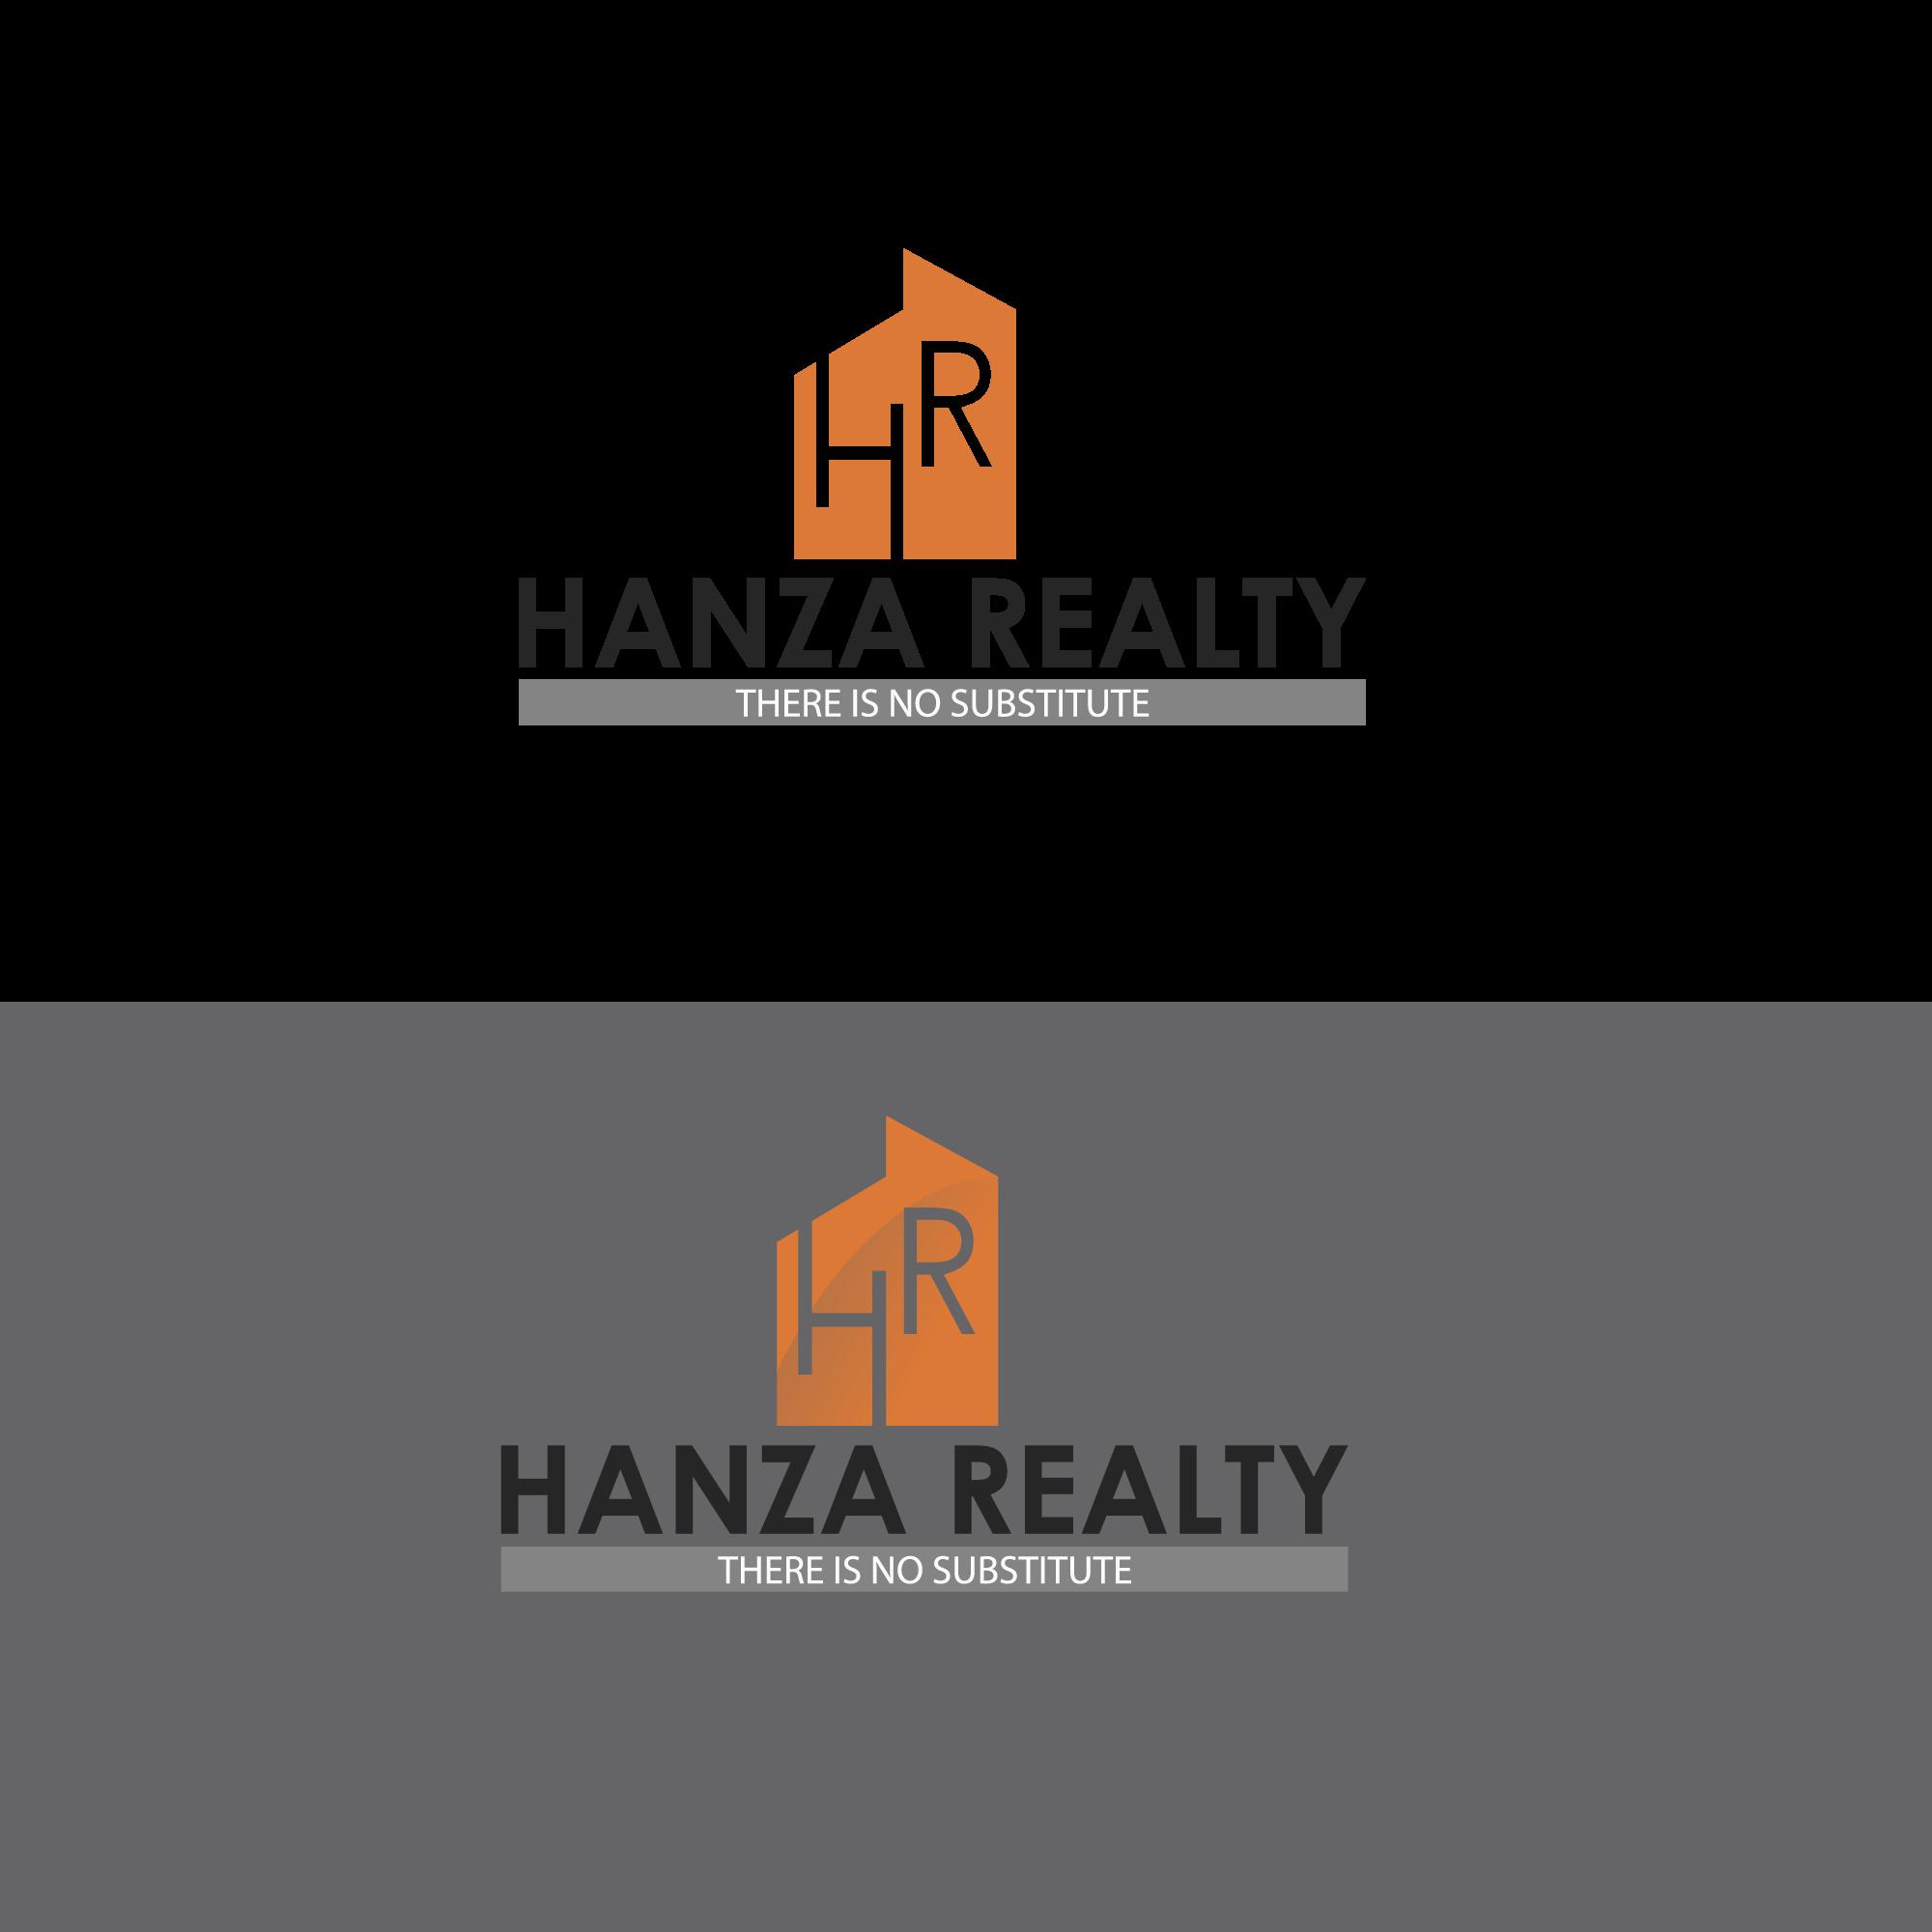 Logo Design by Runz - Entry No. 377 in the Logo Design Contest Logo Design for Hanza Realty.